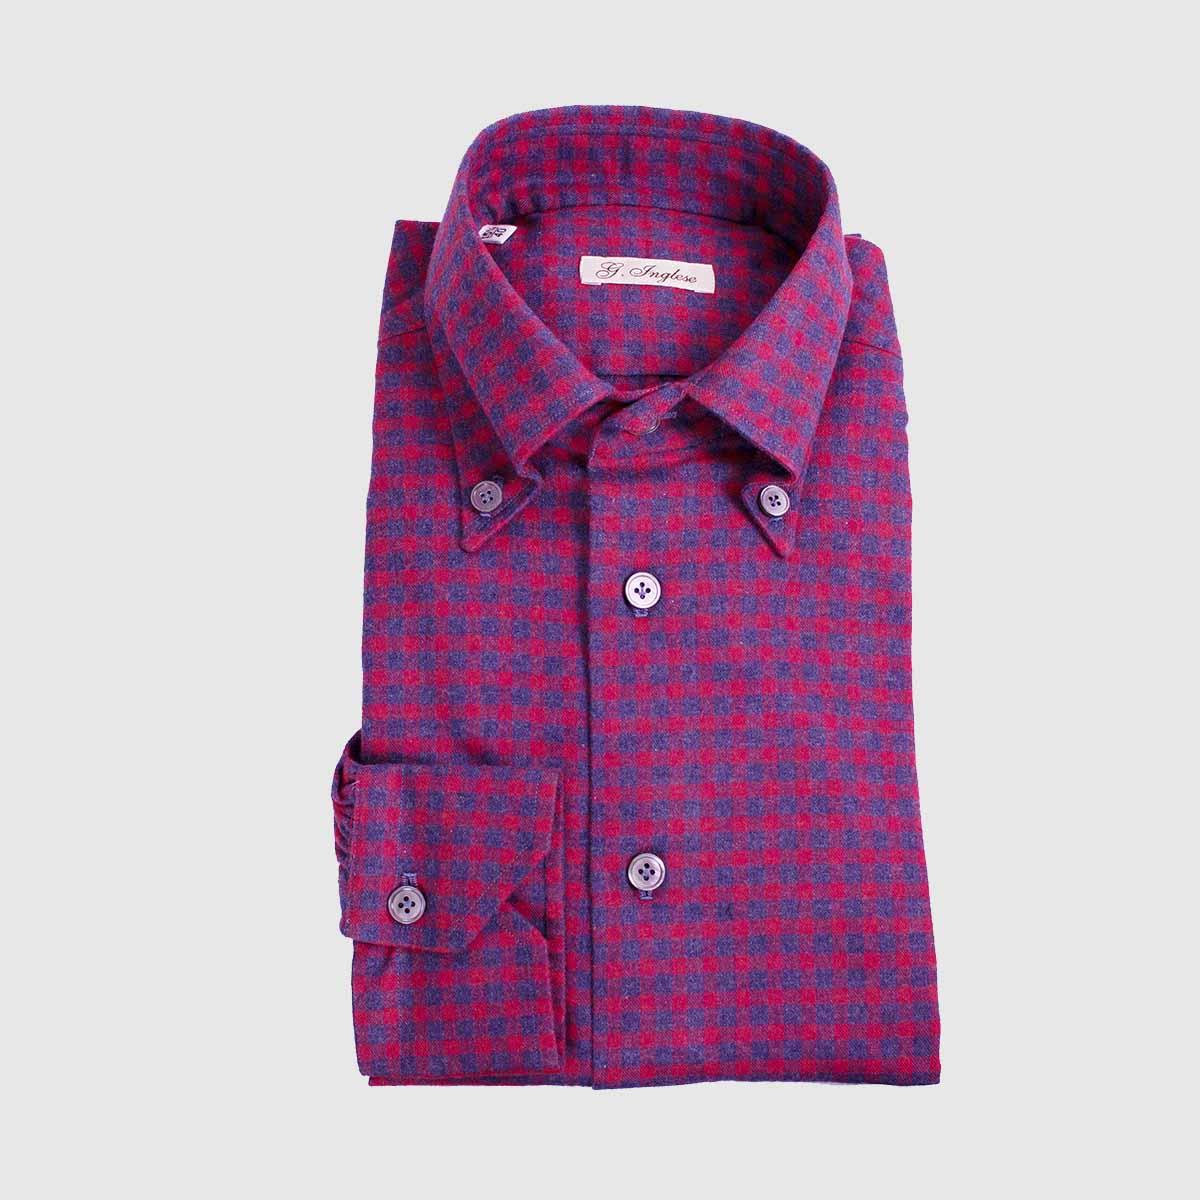 Cotton Red-Blue Gauze Bottom-down Shirt